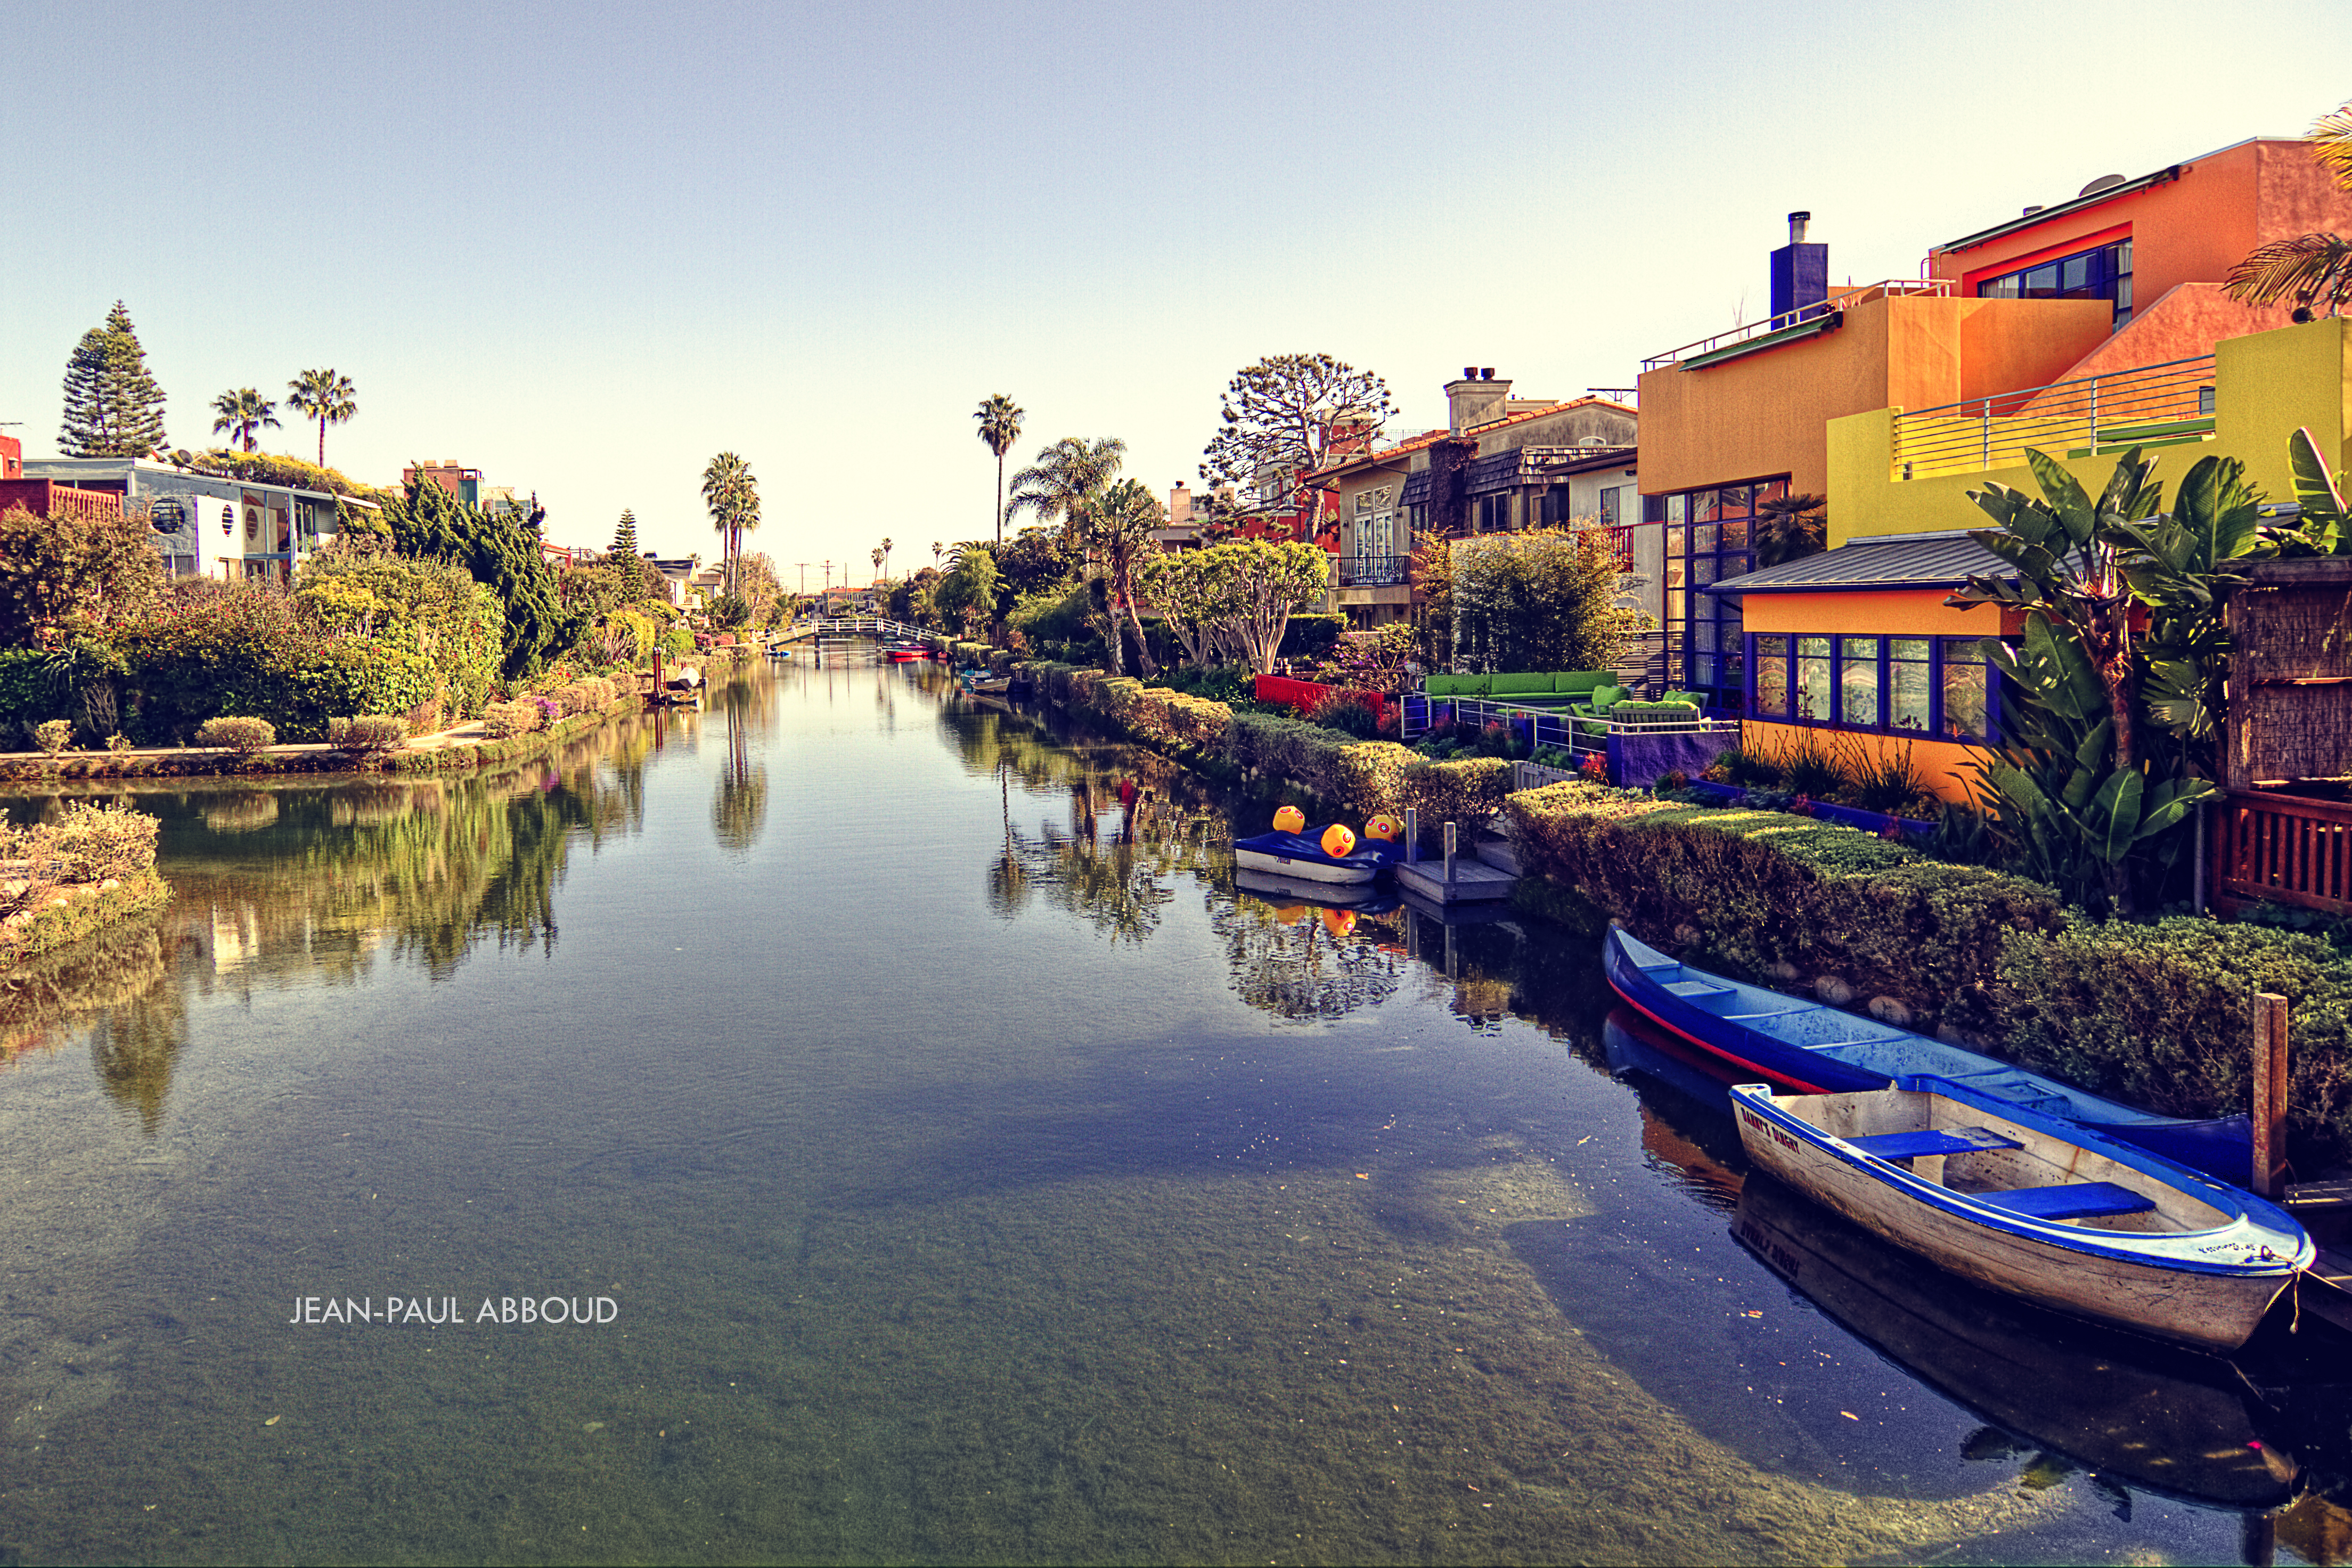 The Venice Canals - Venice, CA